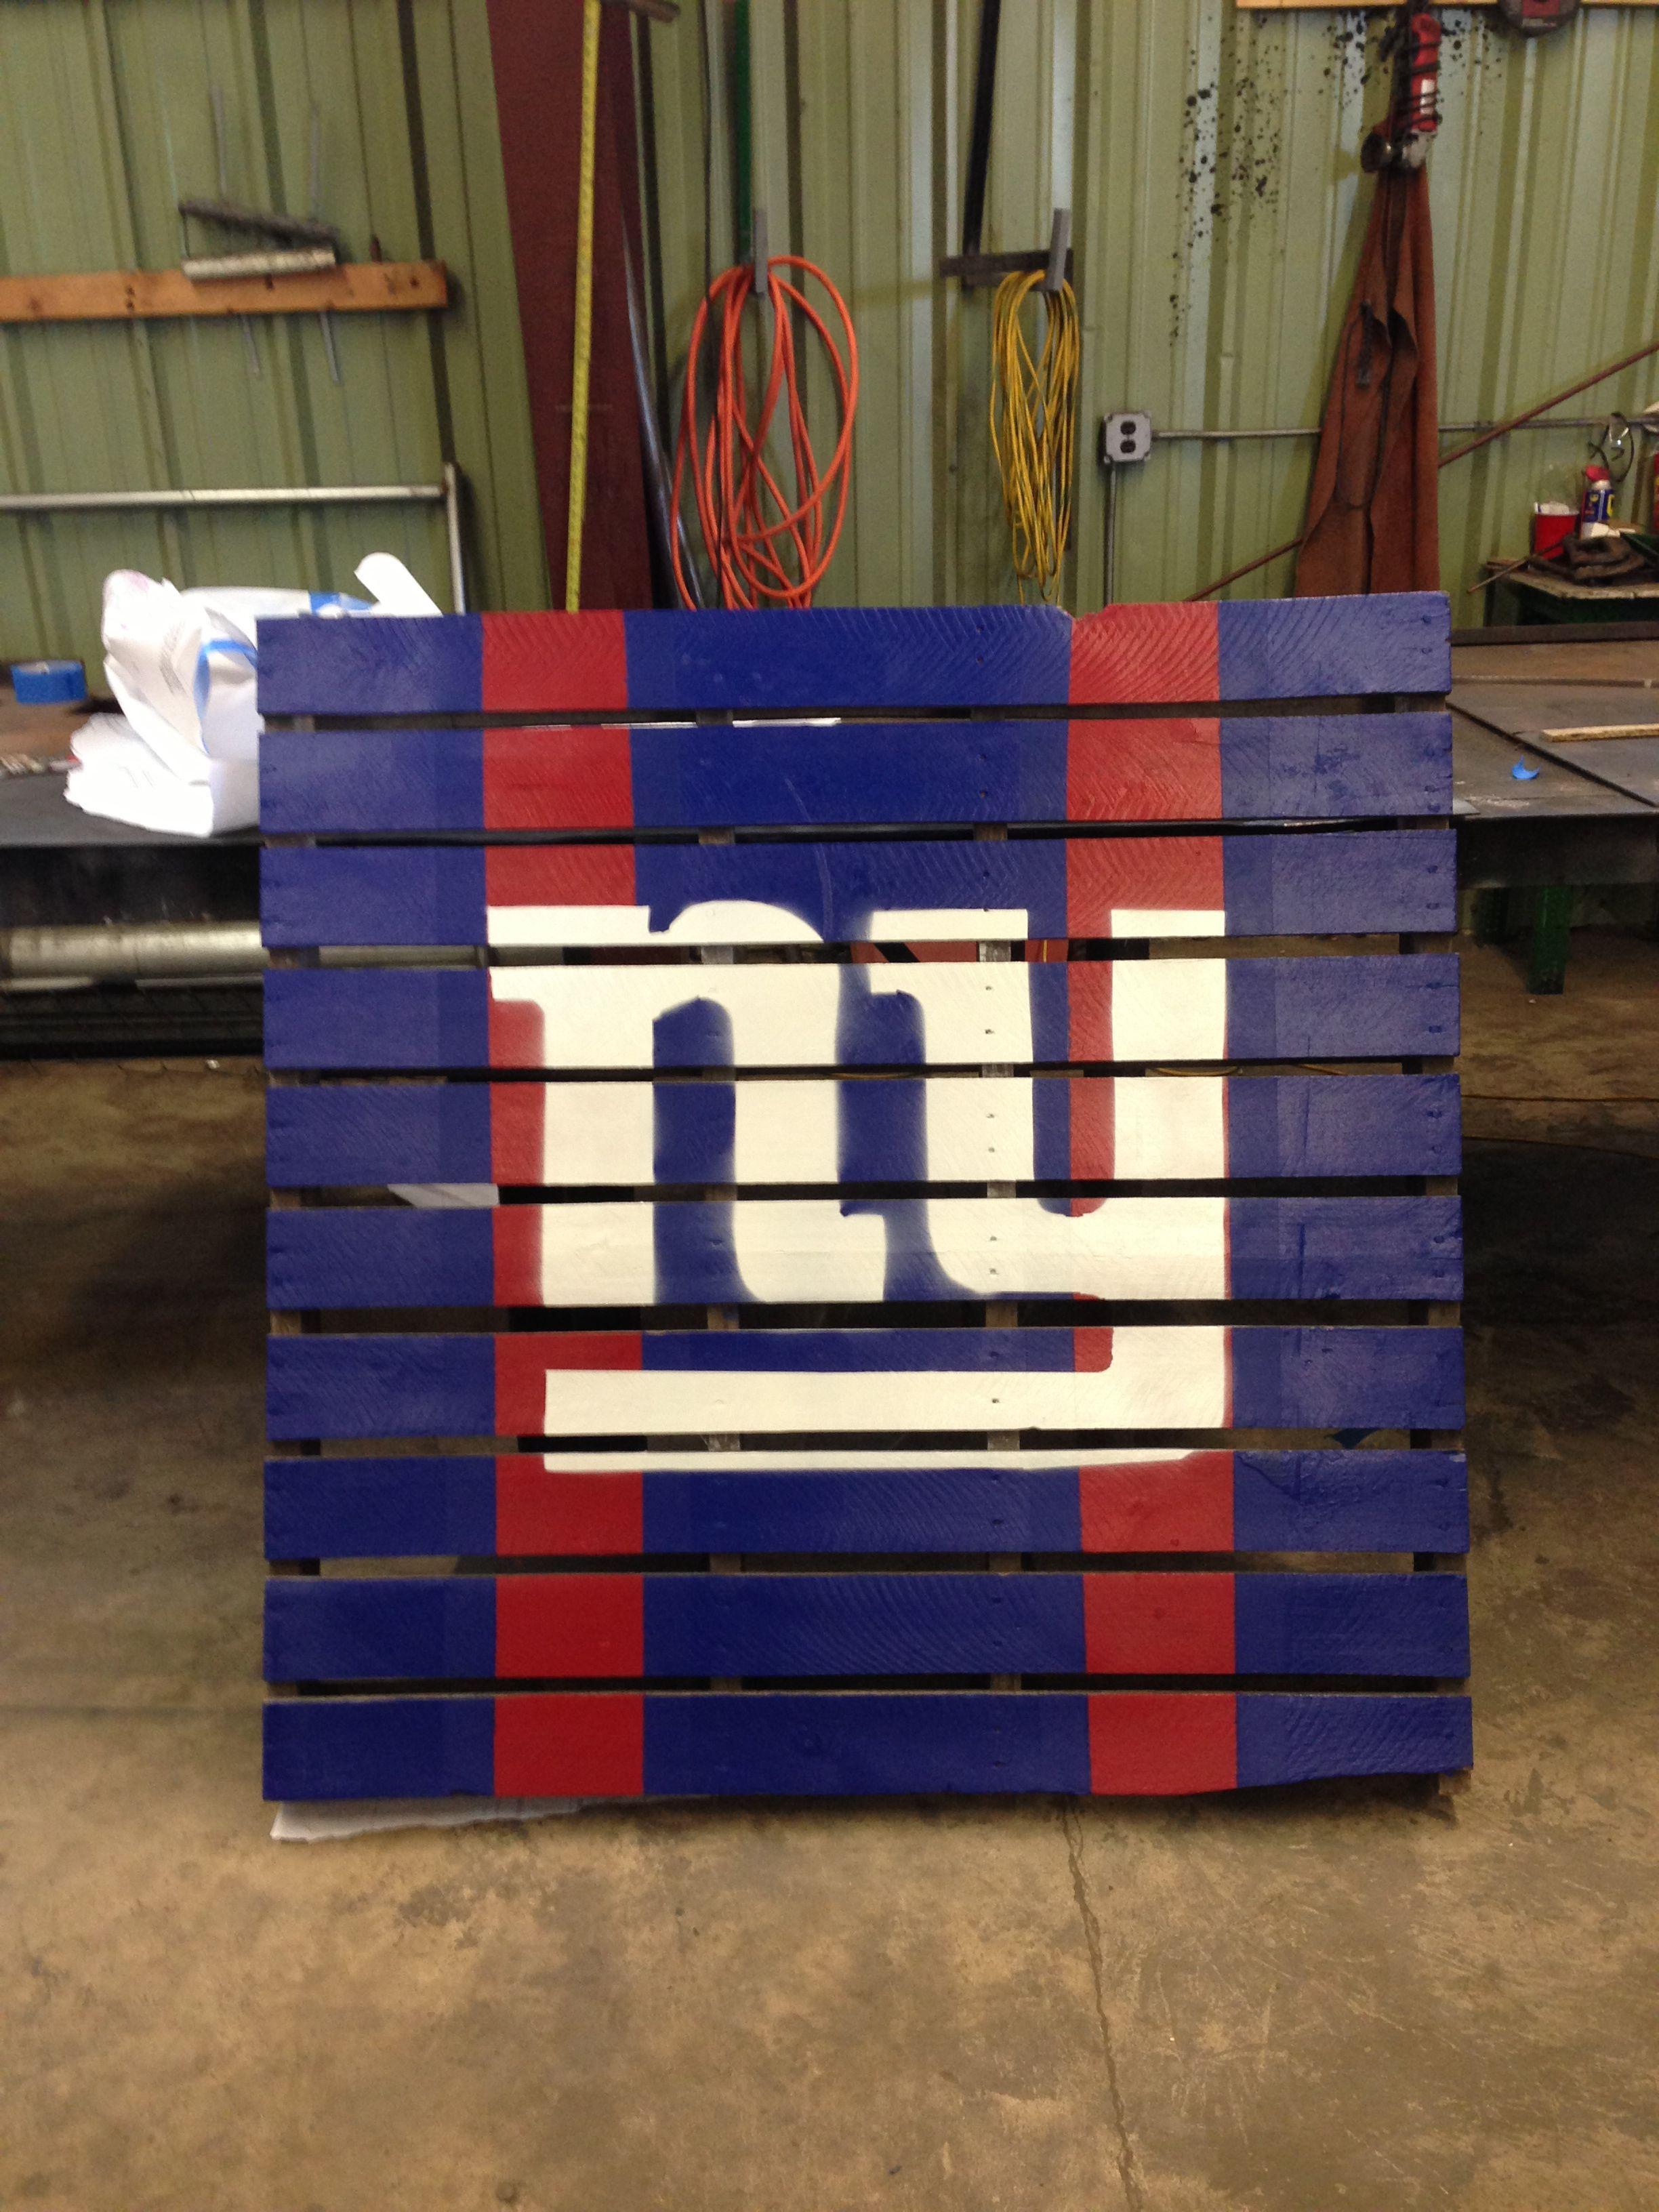 New York Giants Pallet Giants decor, Ny giants football